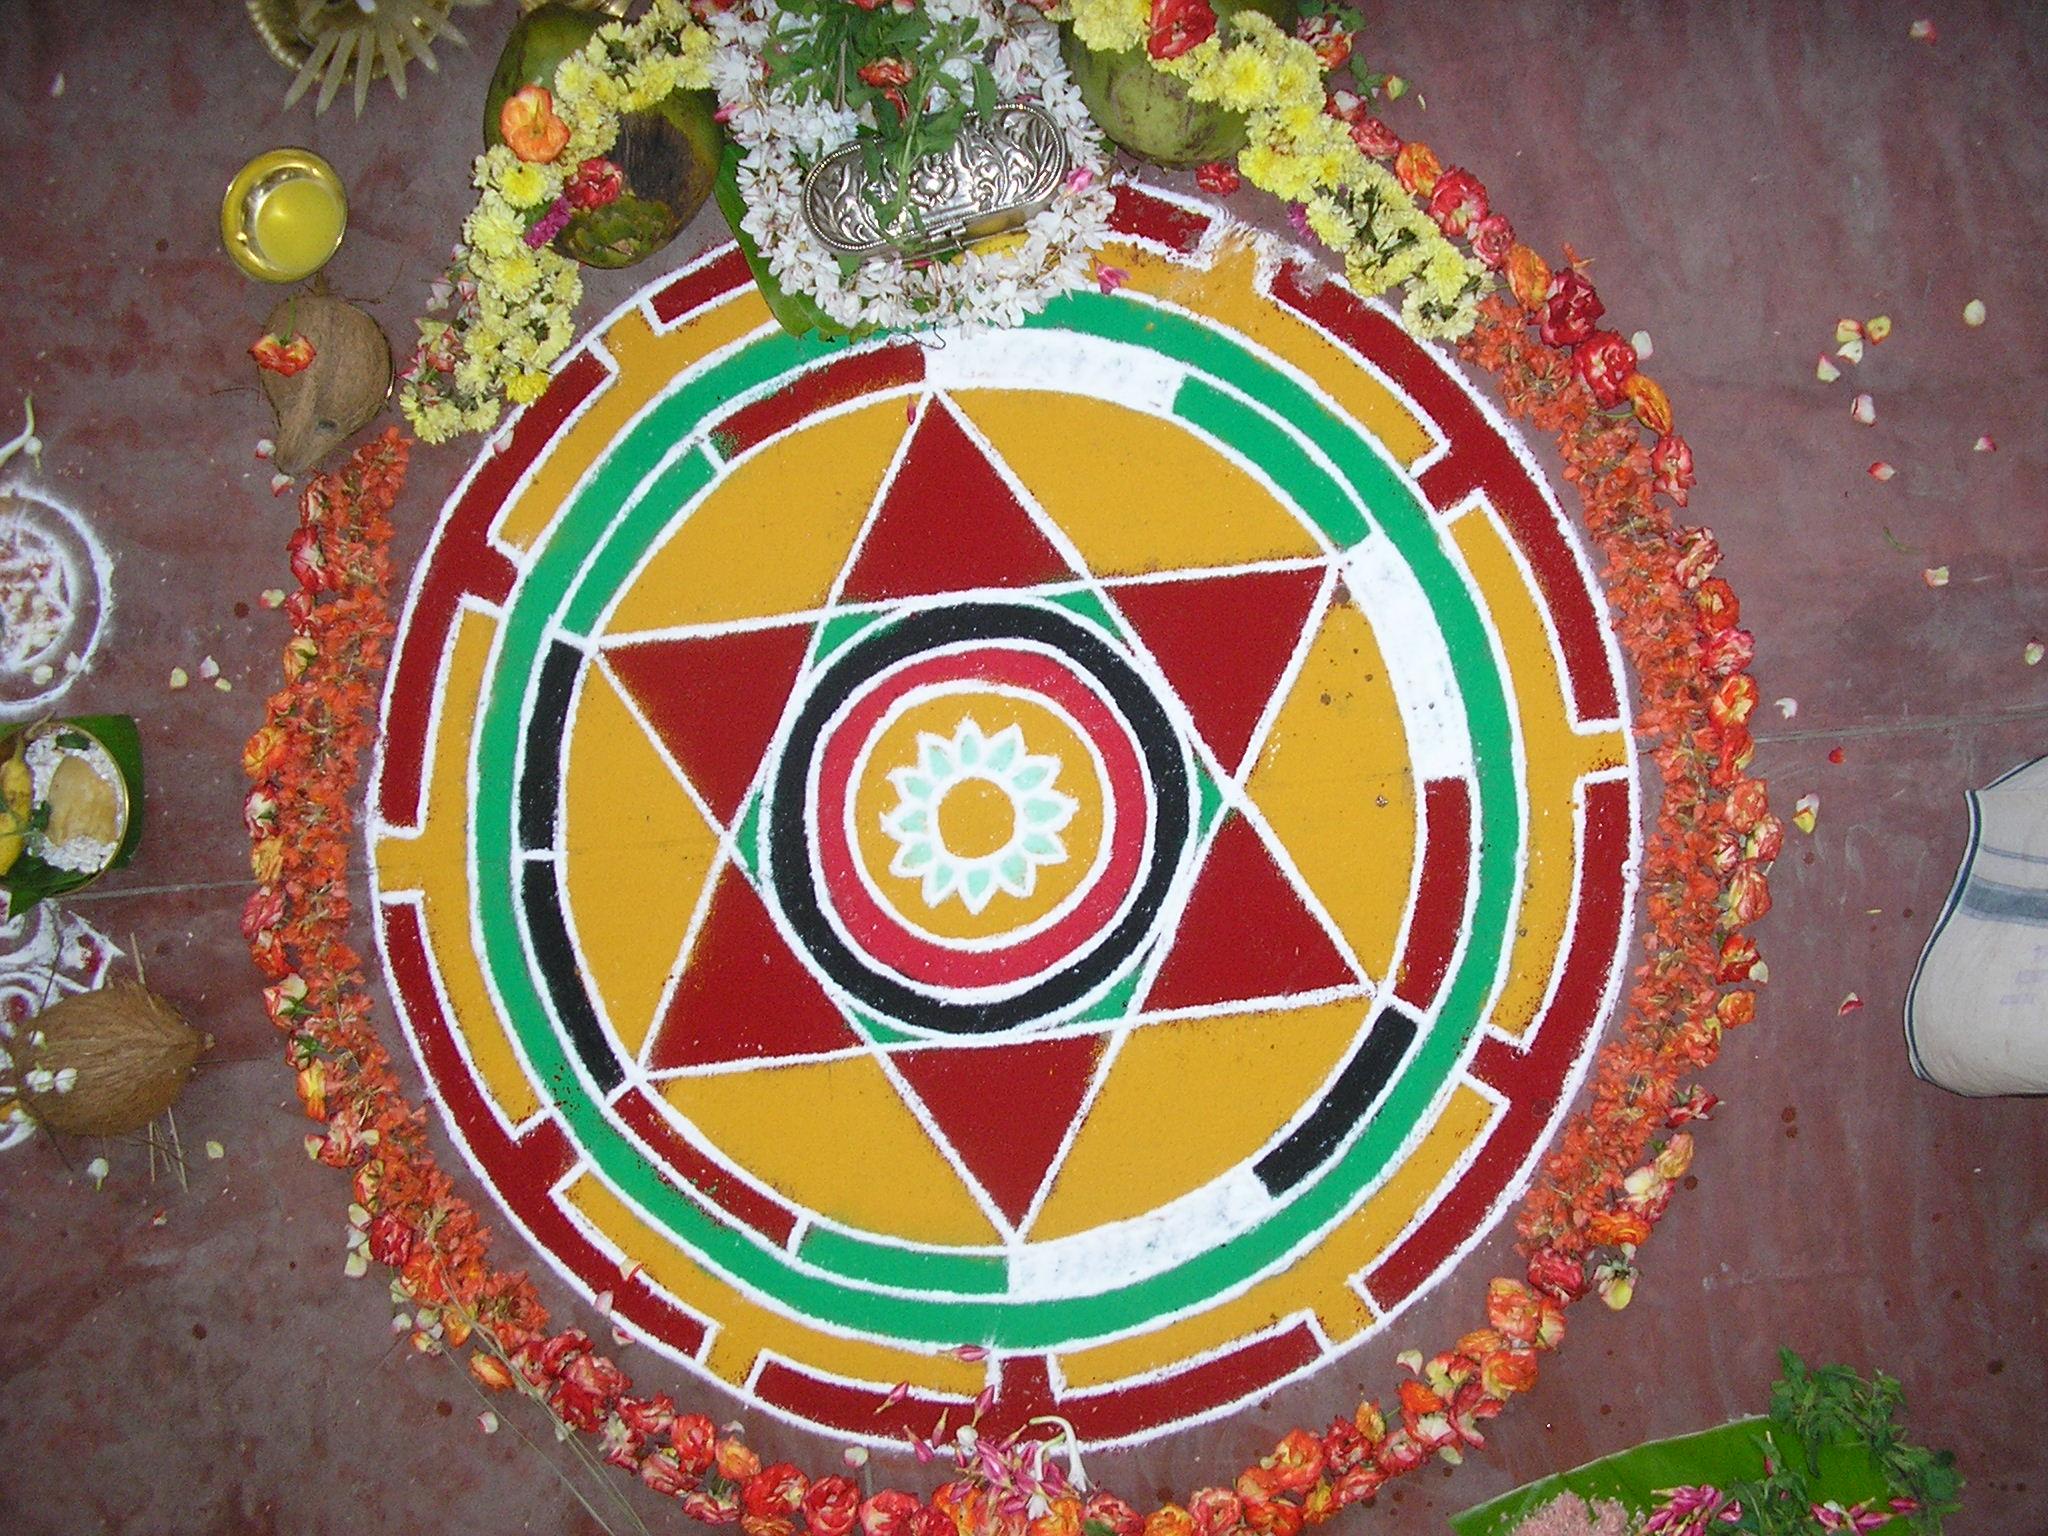 File:Mandala.jpg - Wikipedia